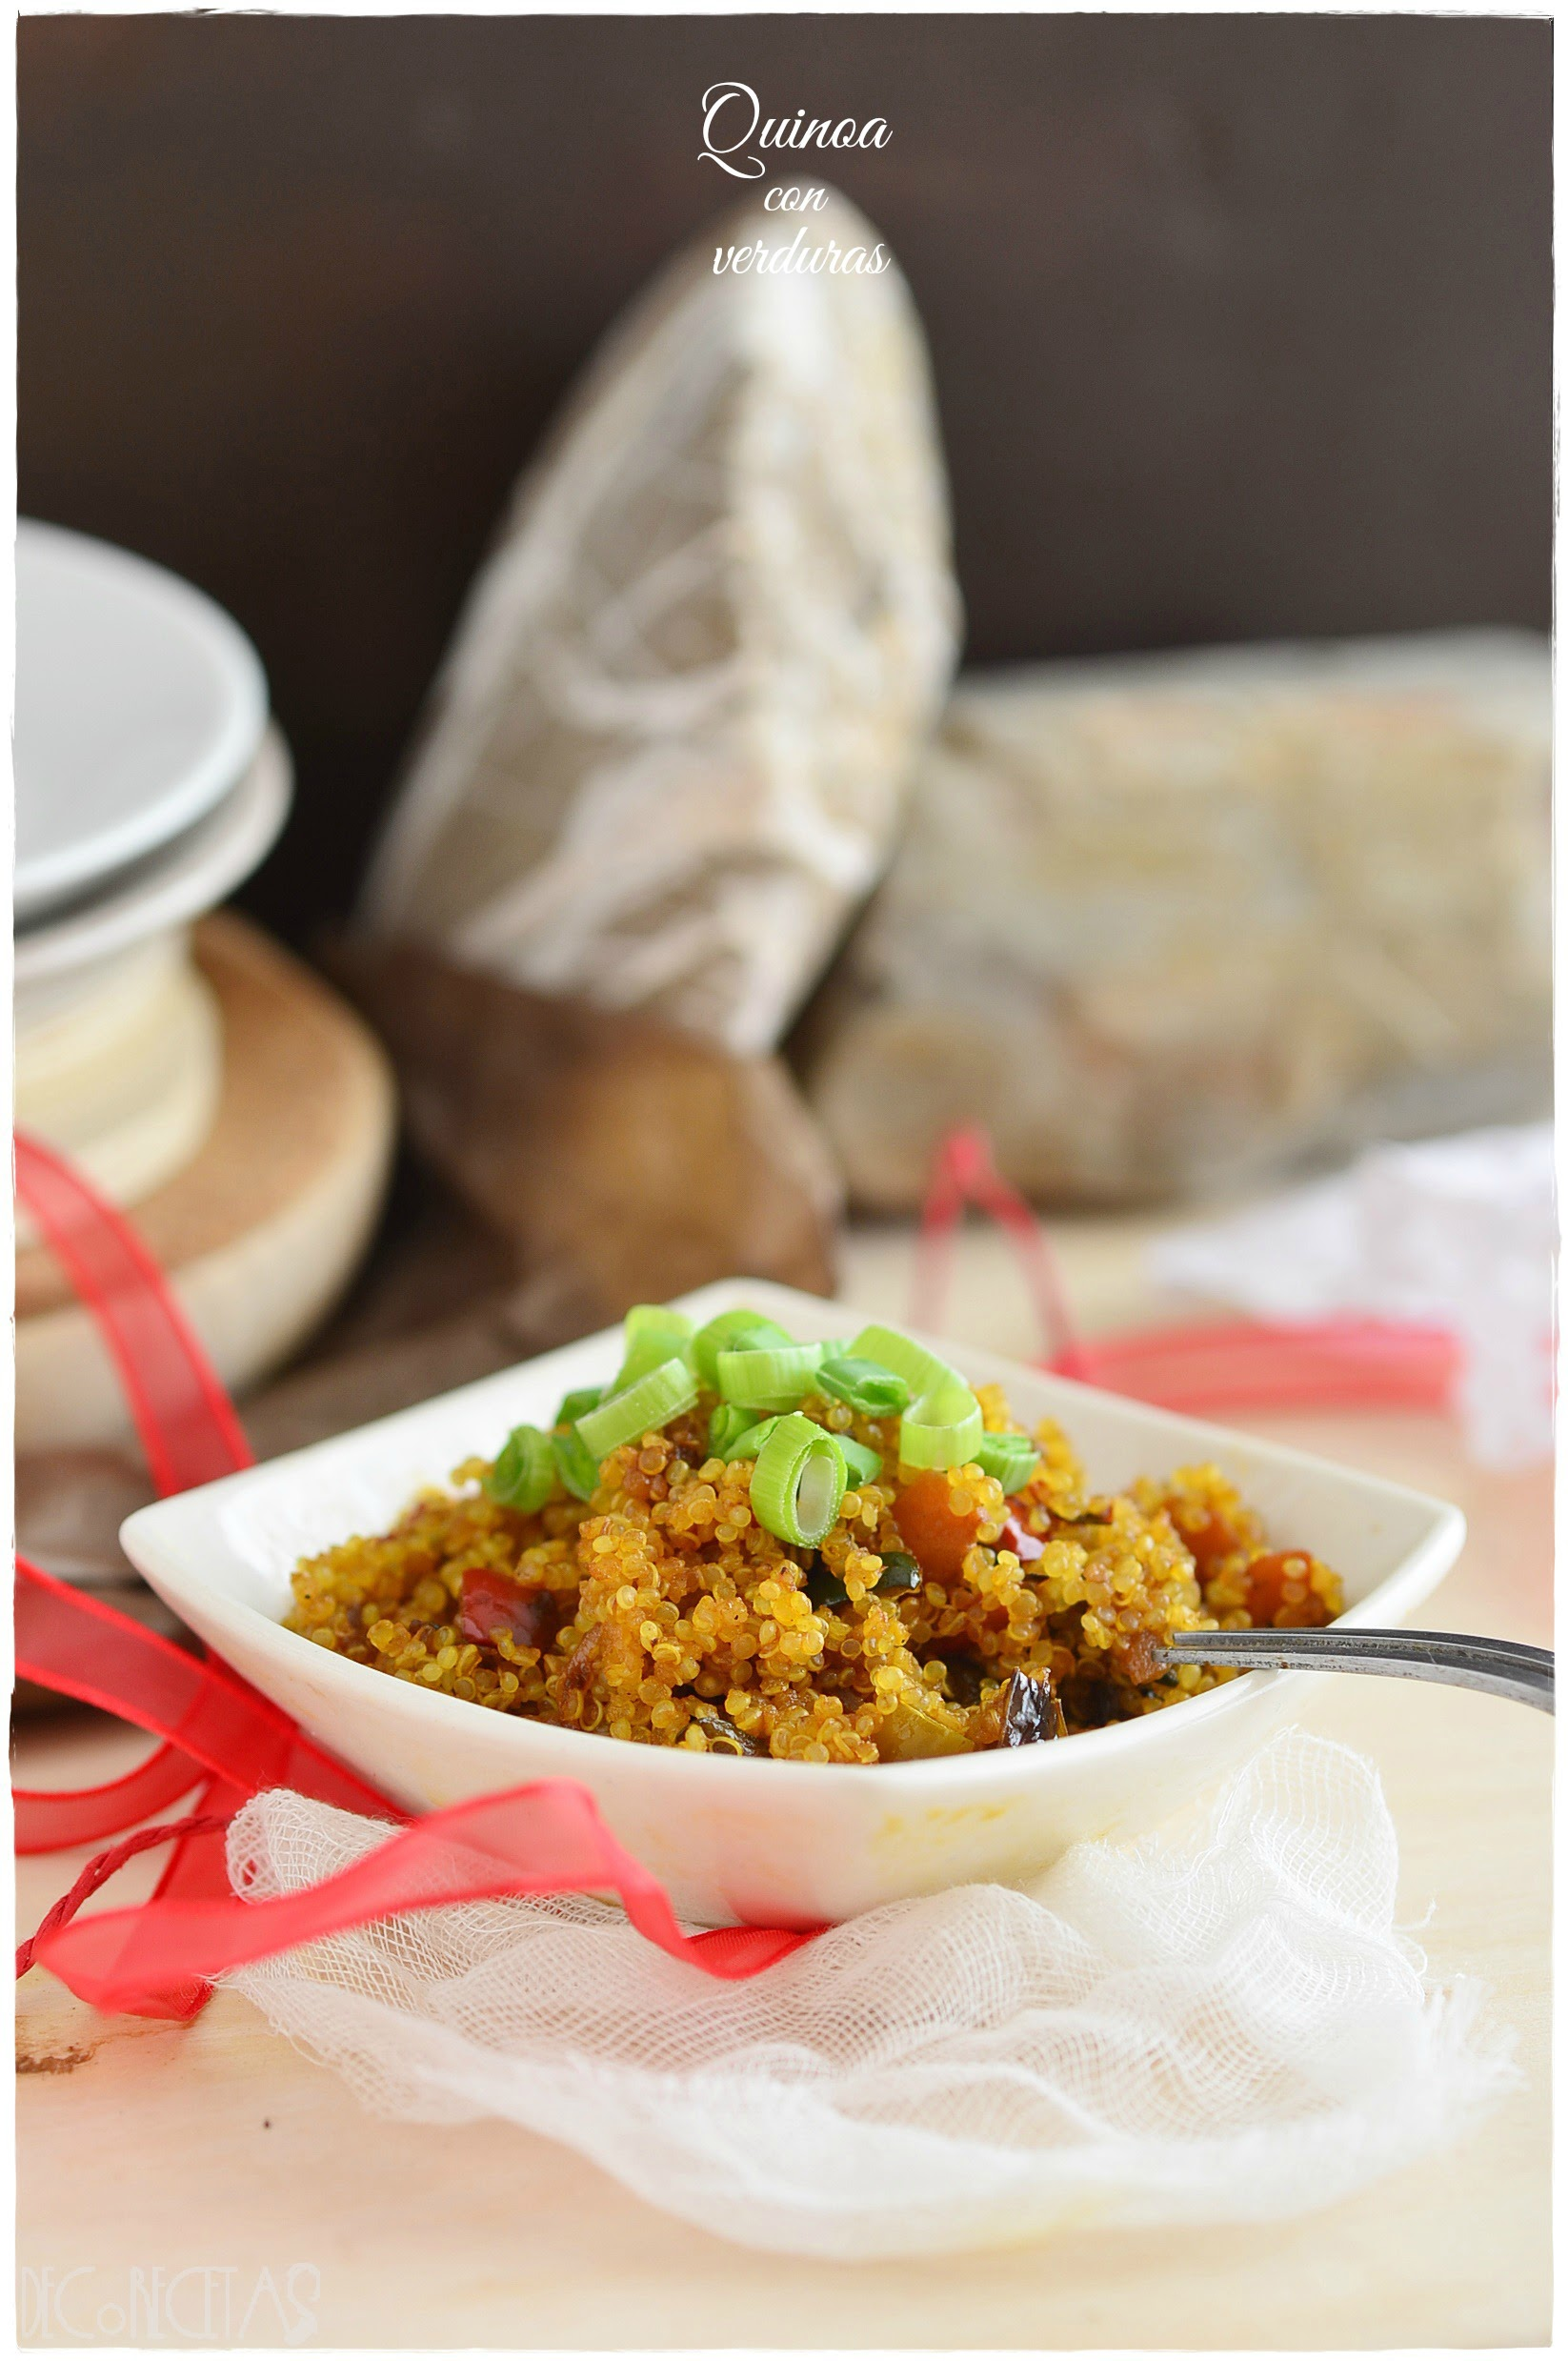 Quinoa con pollo | una manera estupenda de consumir quinoa